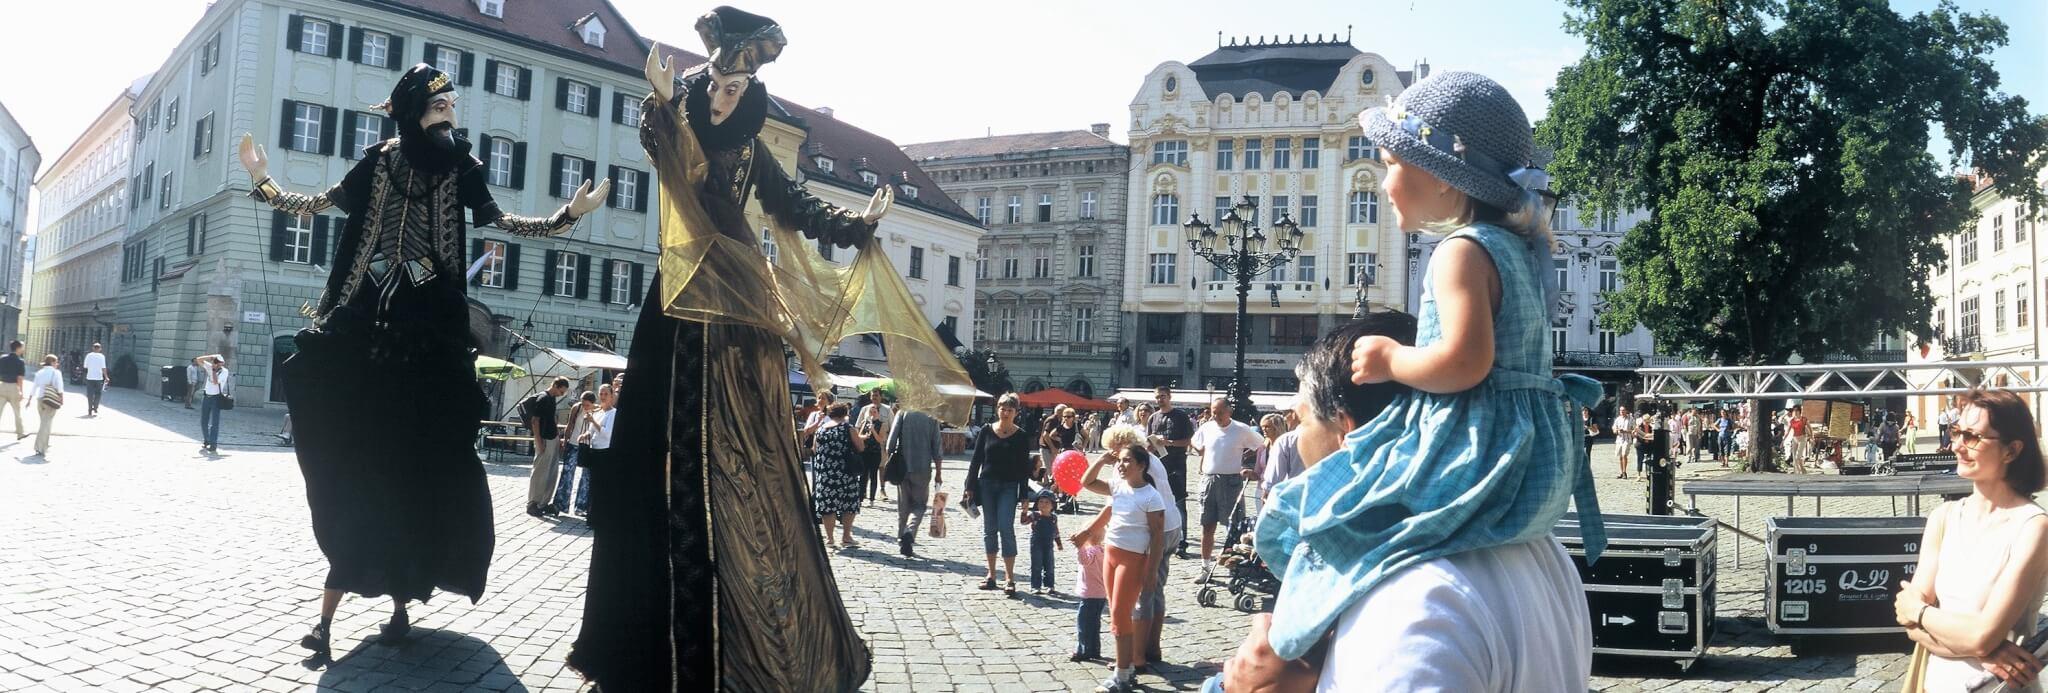 Bratislava in Summer - Main Square